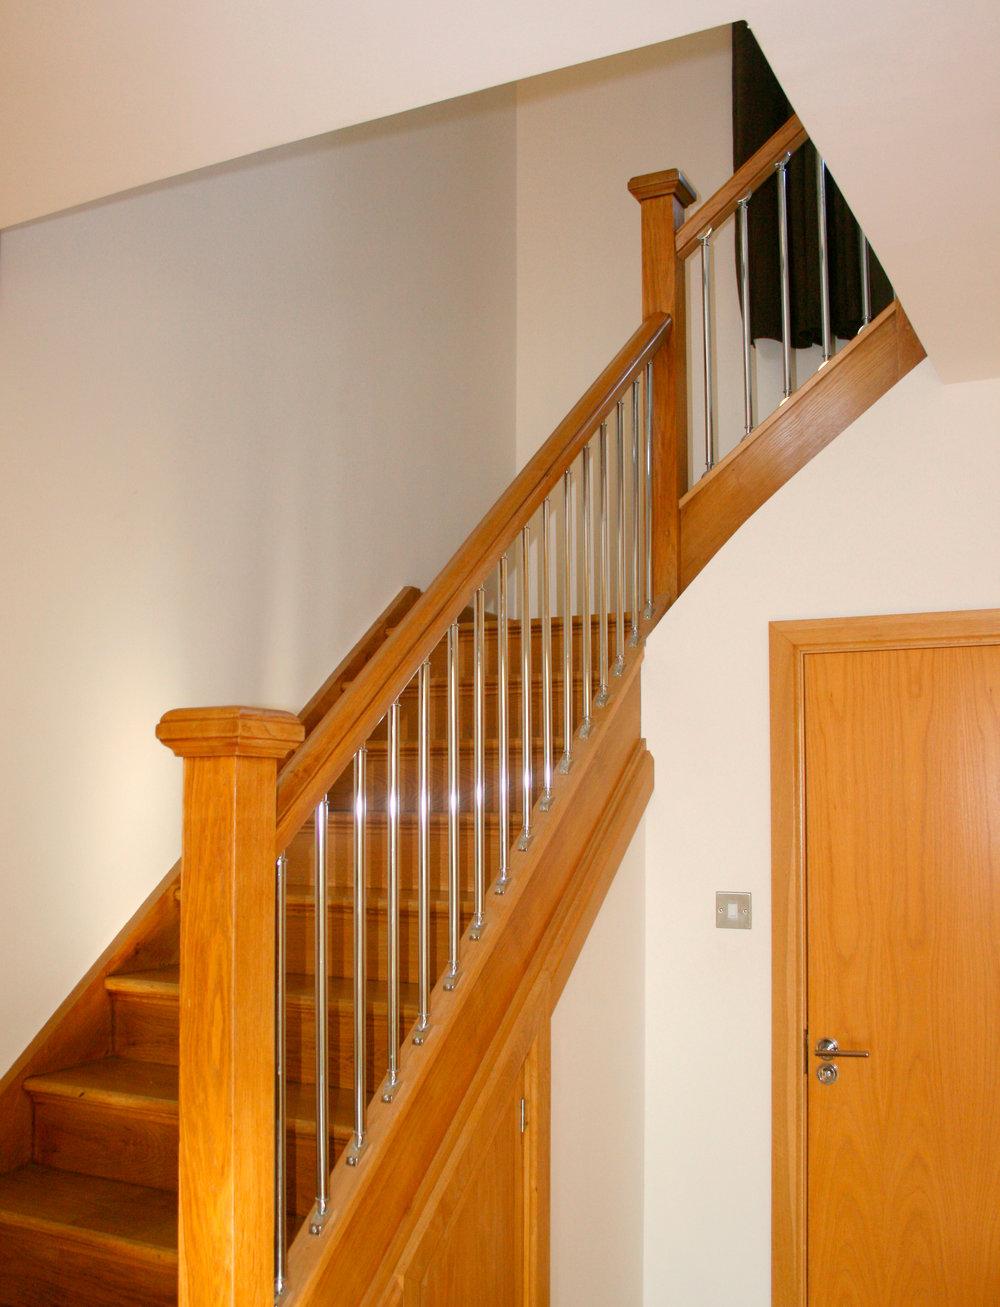 Staircase_01.jpg